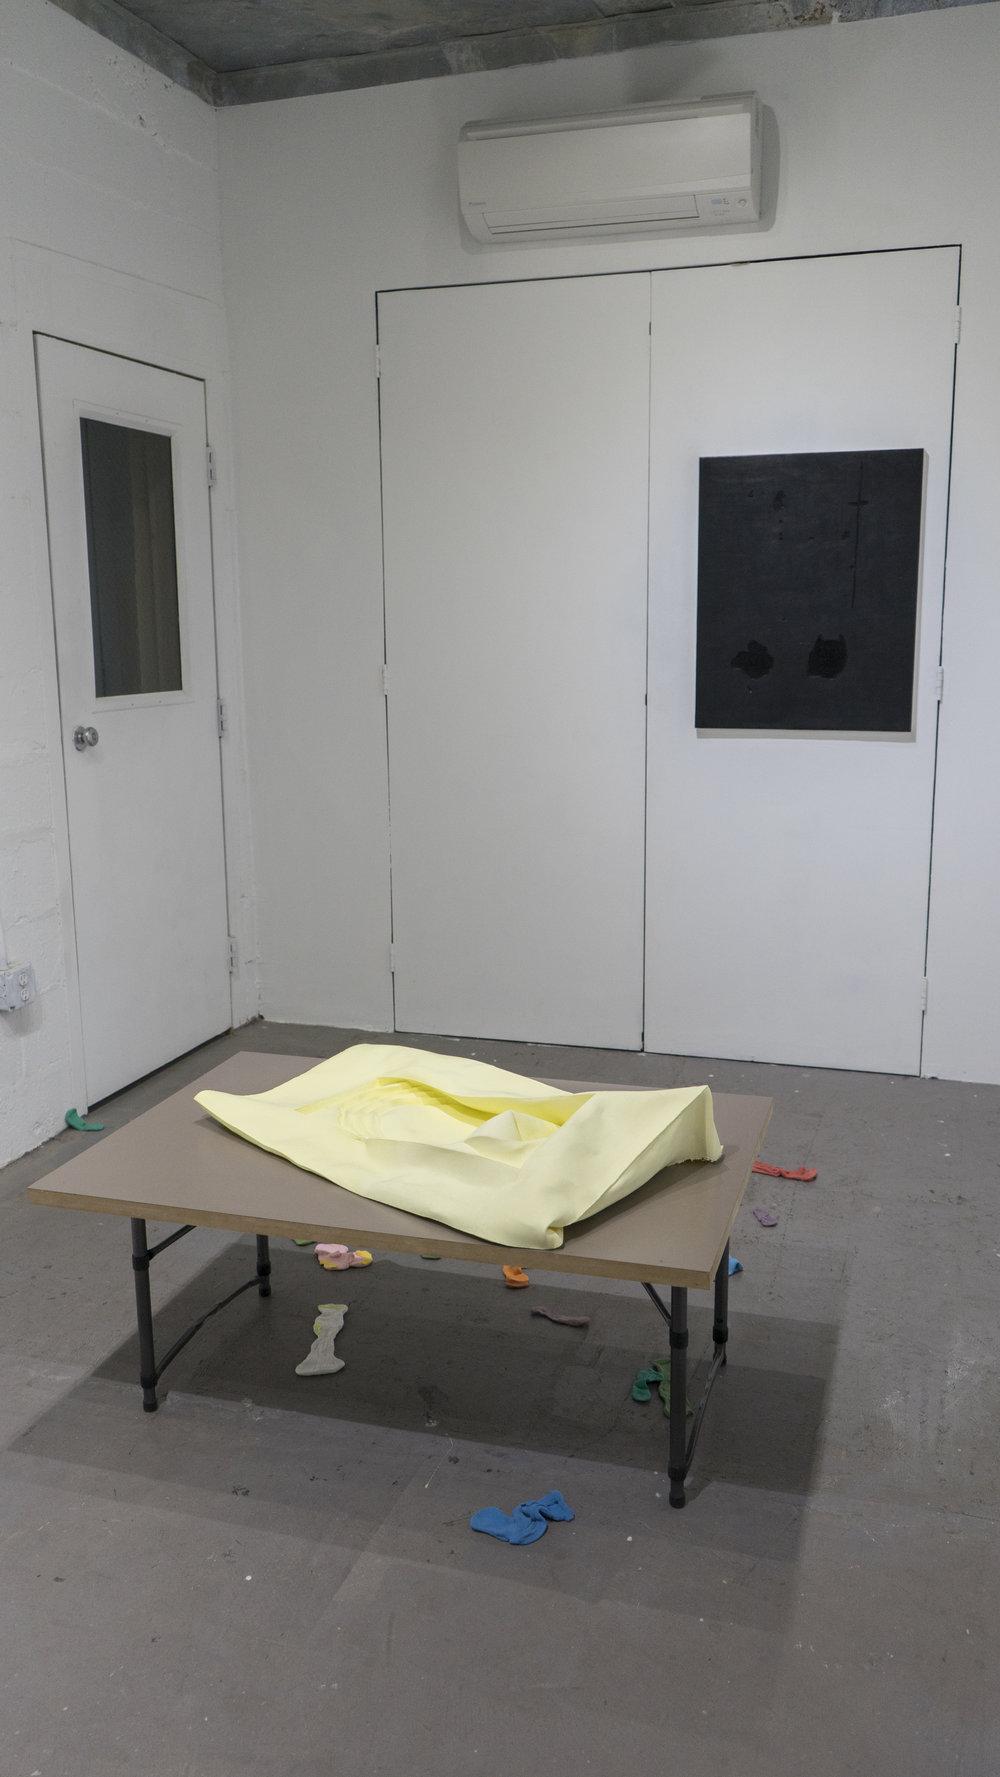 John Dickinson  Yellow Pool  (2016), Bridget Bailey  Kitchen Table-Floor-Bed-Socks (2017), Douglas Degges  Barbara White  (2015)